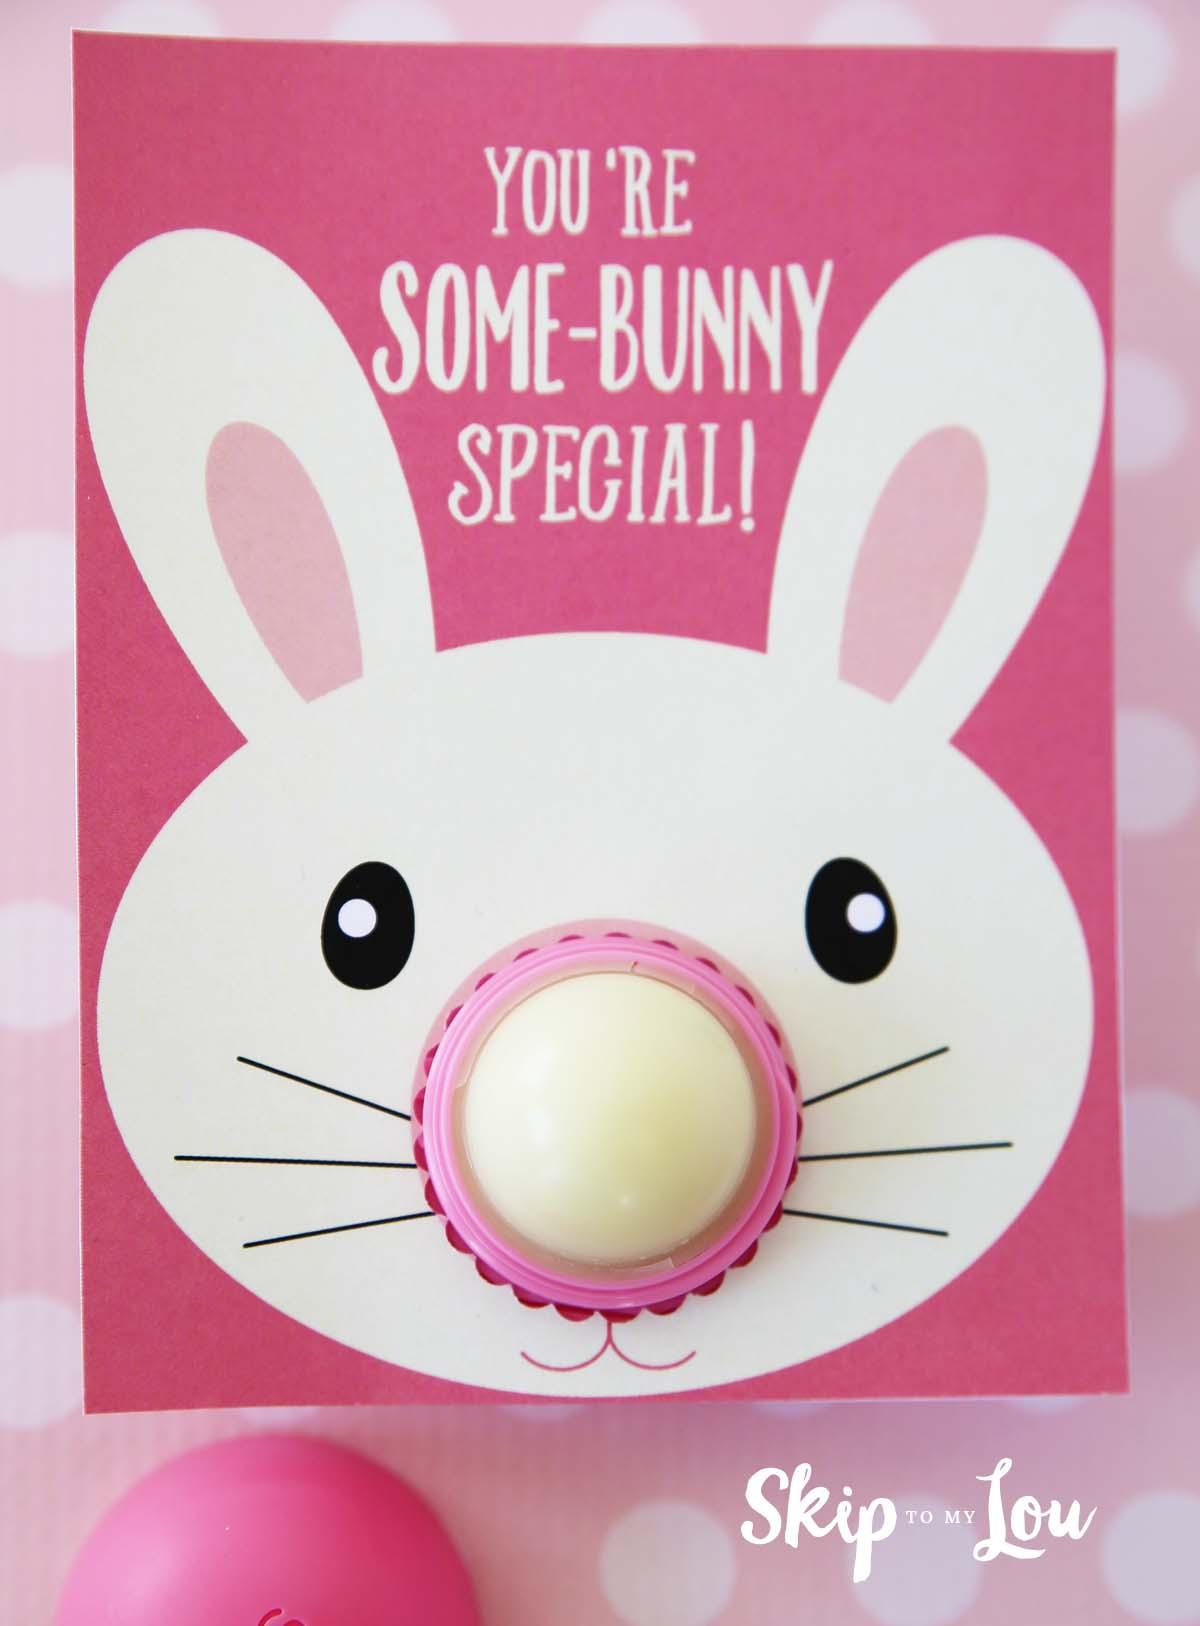 Bunny eos lip balm gift skip to my lou eos easter gift bunny eos lip balm printable negle Choice Image